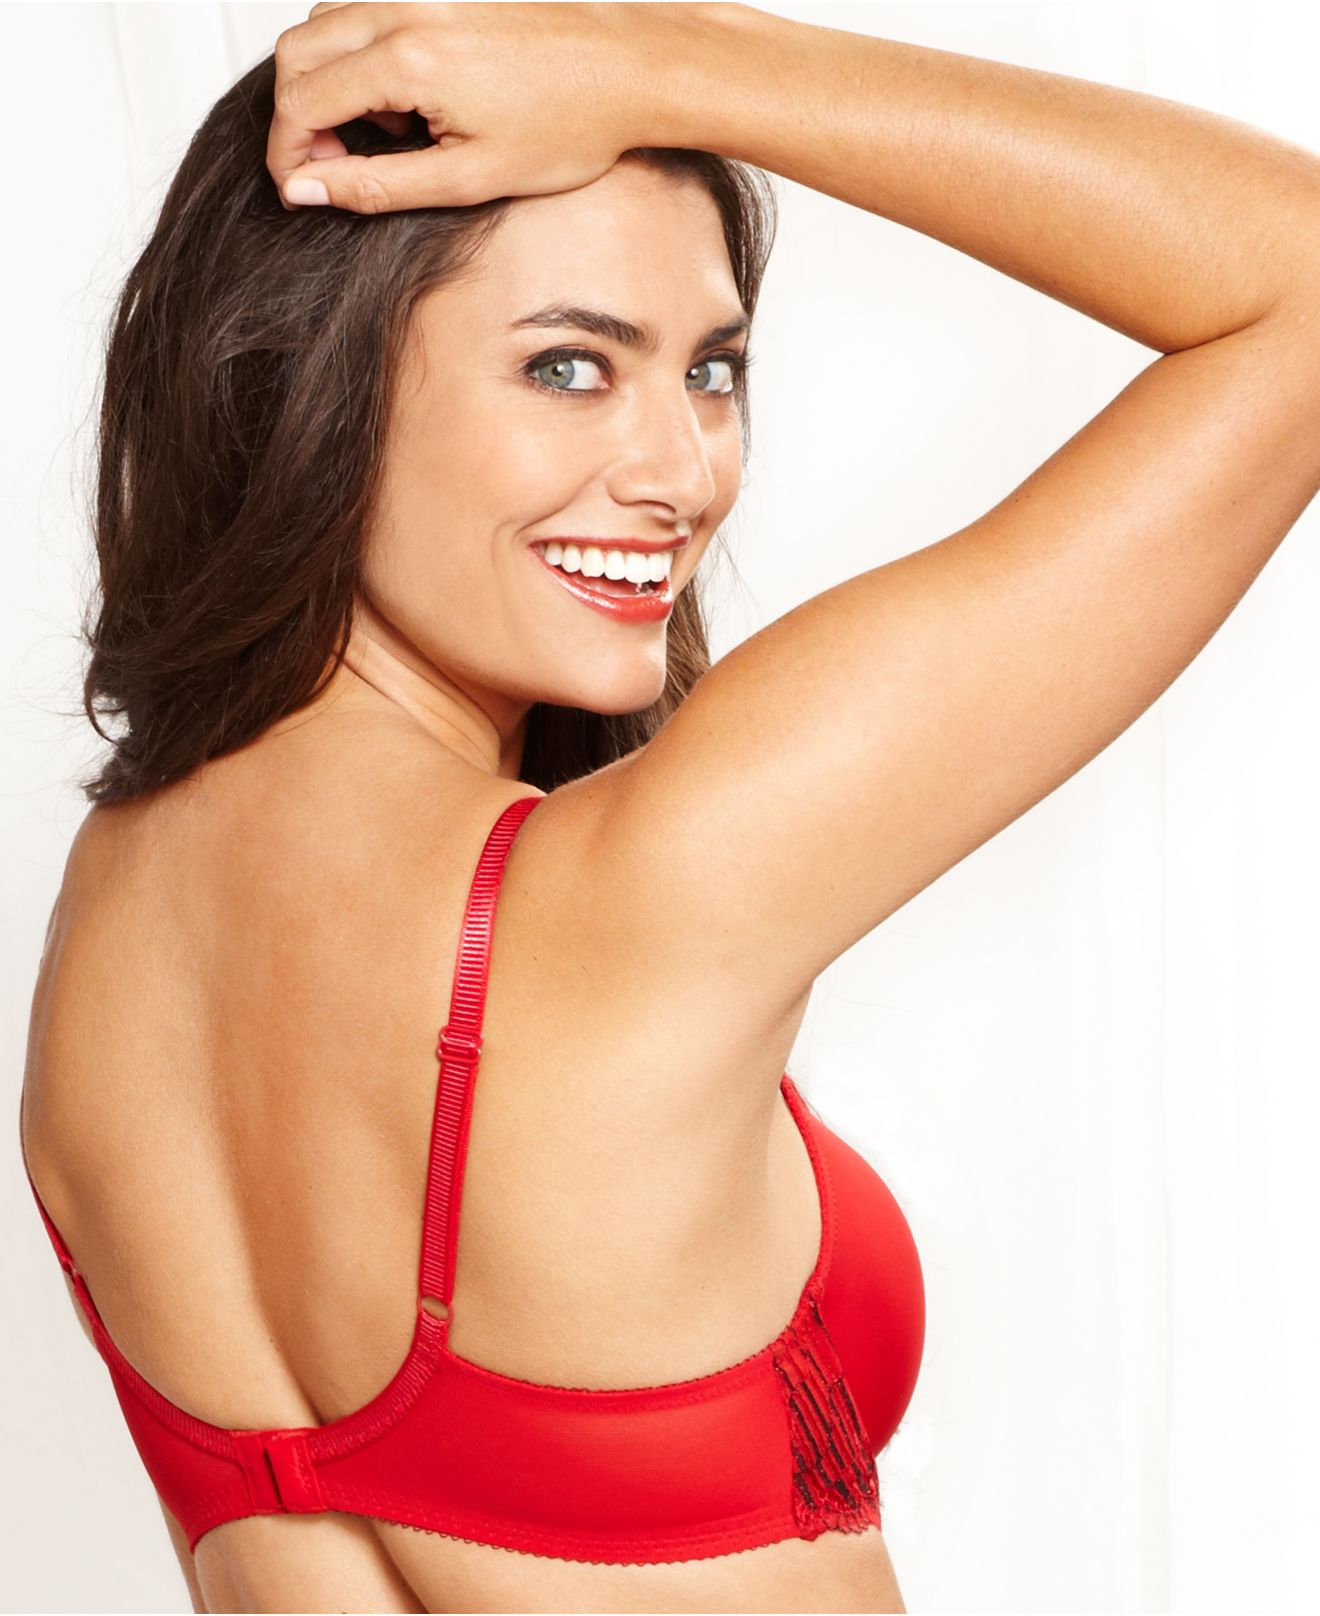 Lyst wacoal la femme lurex contour bra 853217 in red - Bras tatoue femme ...